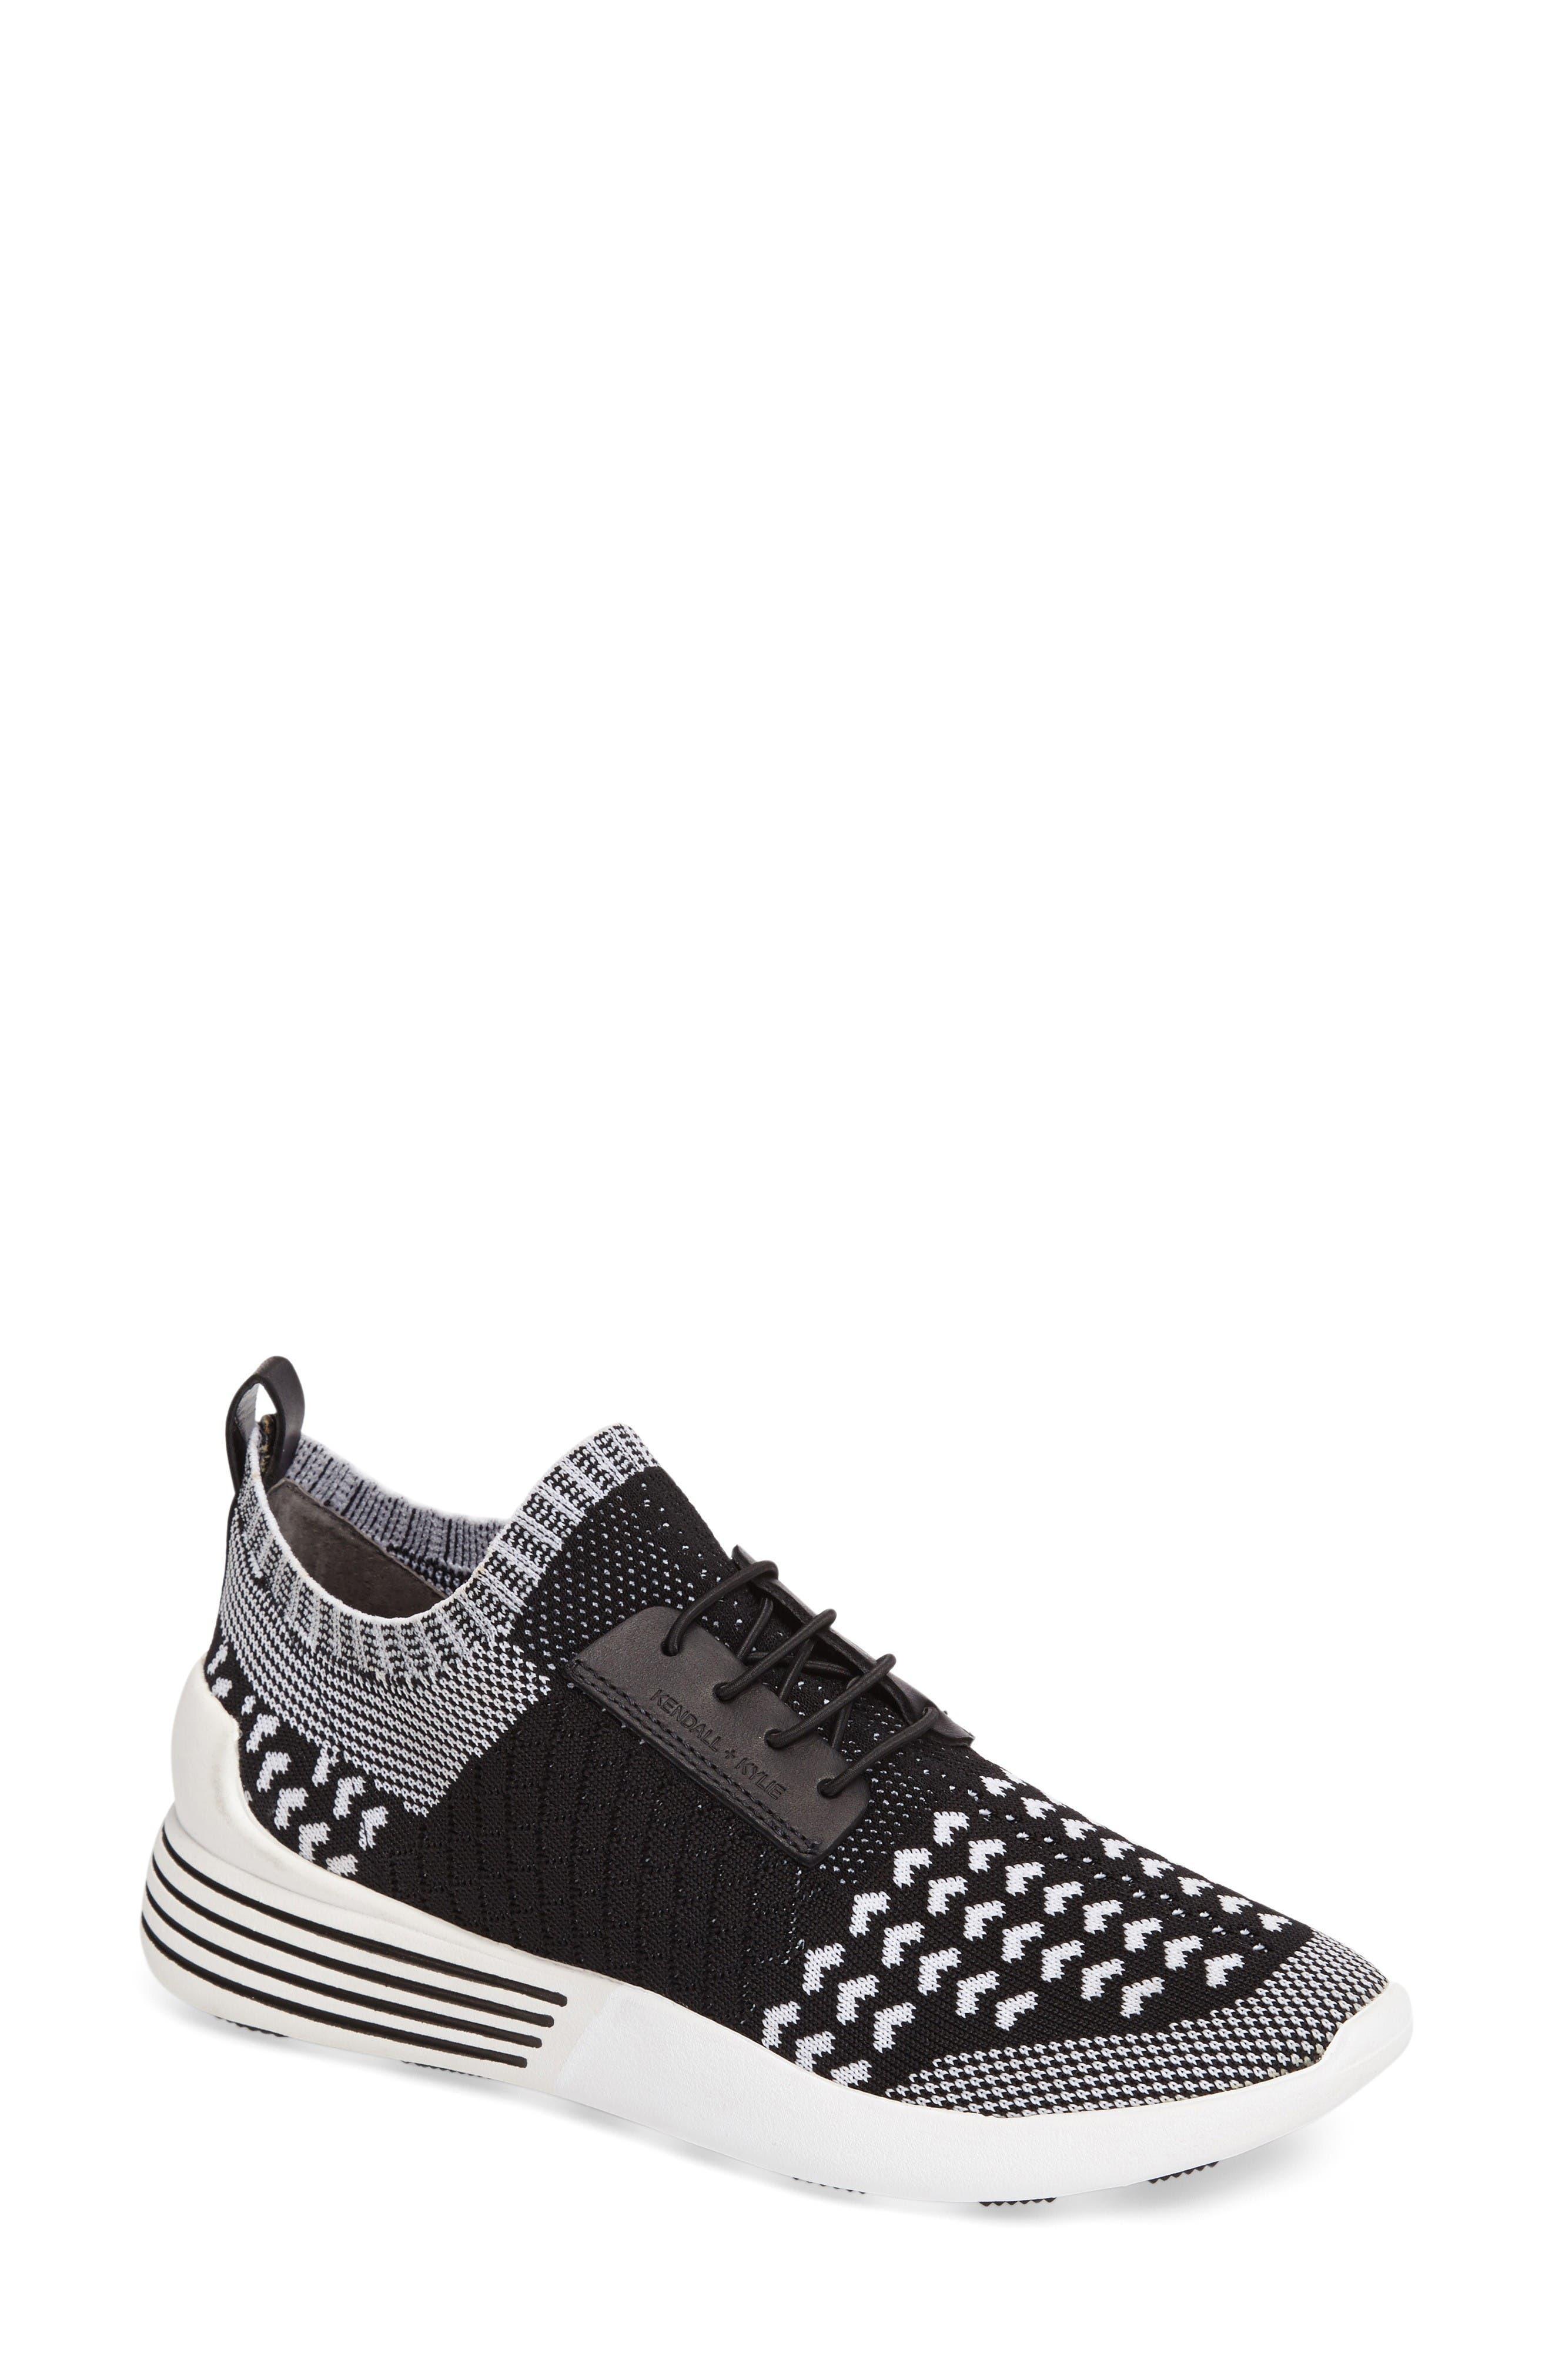 KENDALL + KYLIE Brandy Woven Sneaker